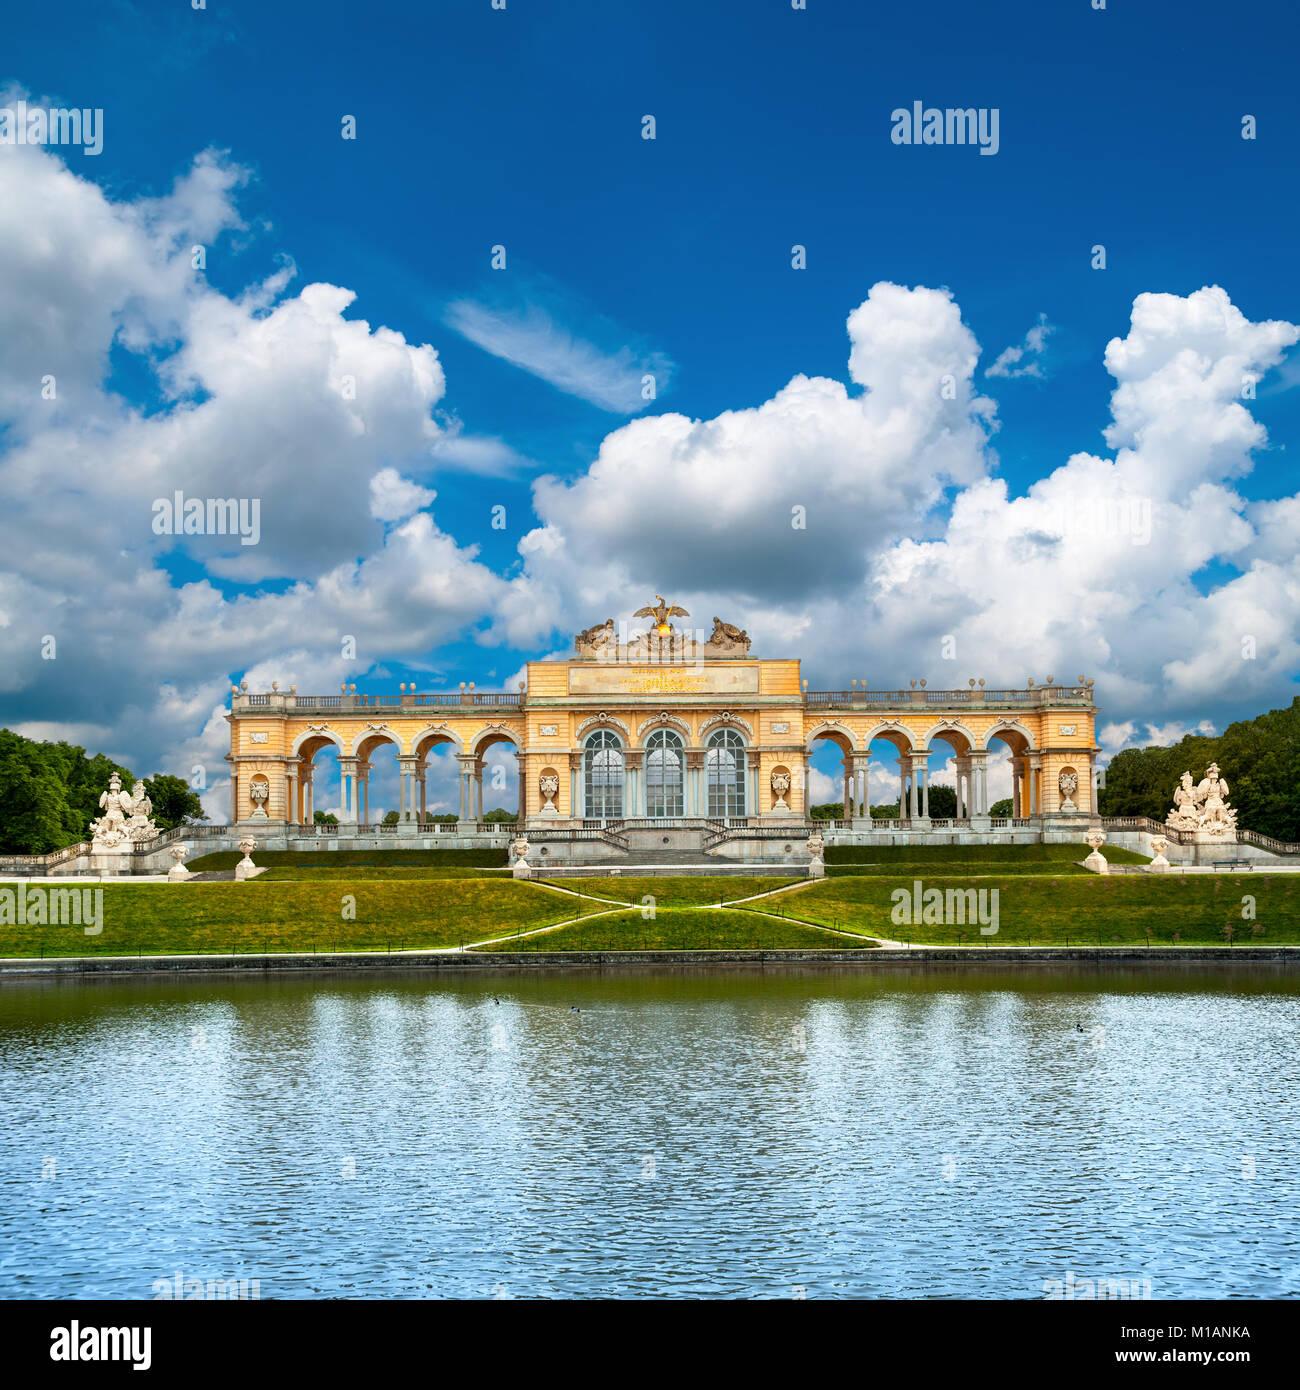 The Gloriette in Schoenbrunn Palace Garden, Vienna - Stock Image